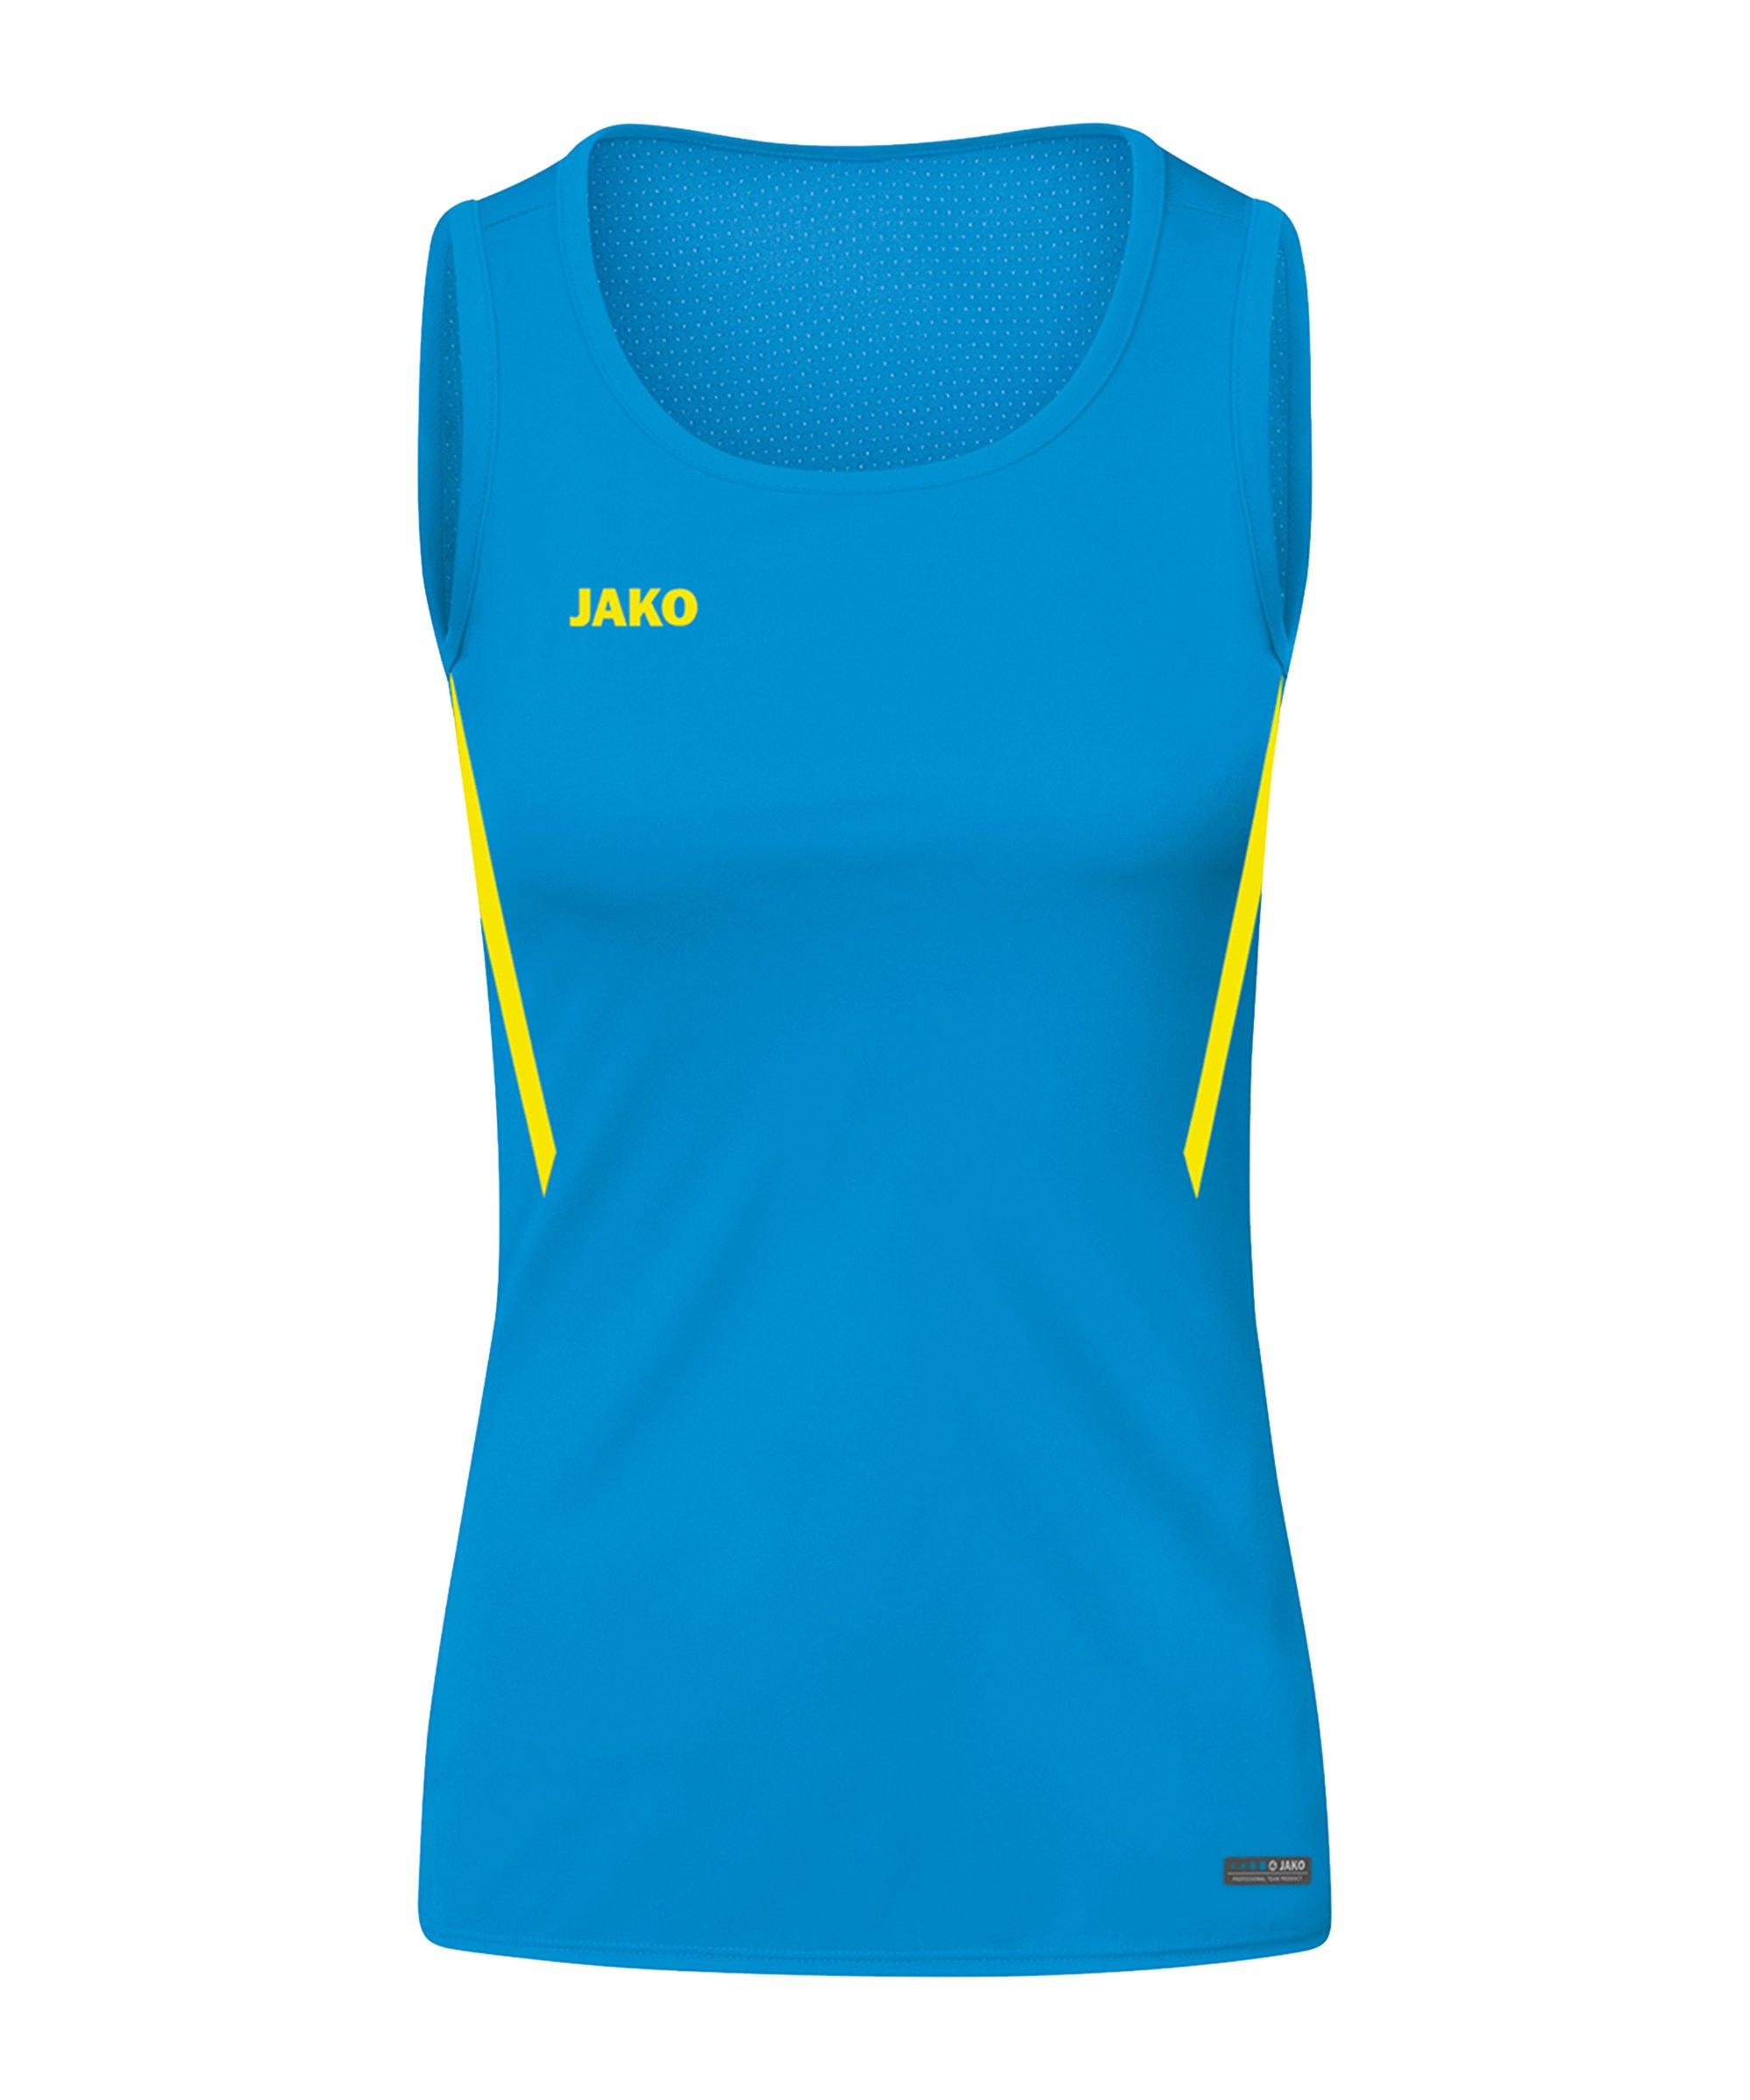 JAKO Challenge Tanktop Damen Blau Gelb F443 - blau